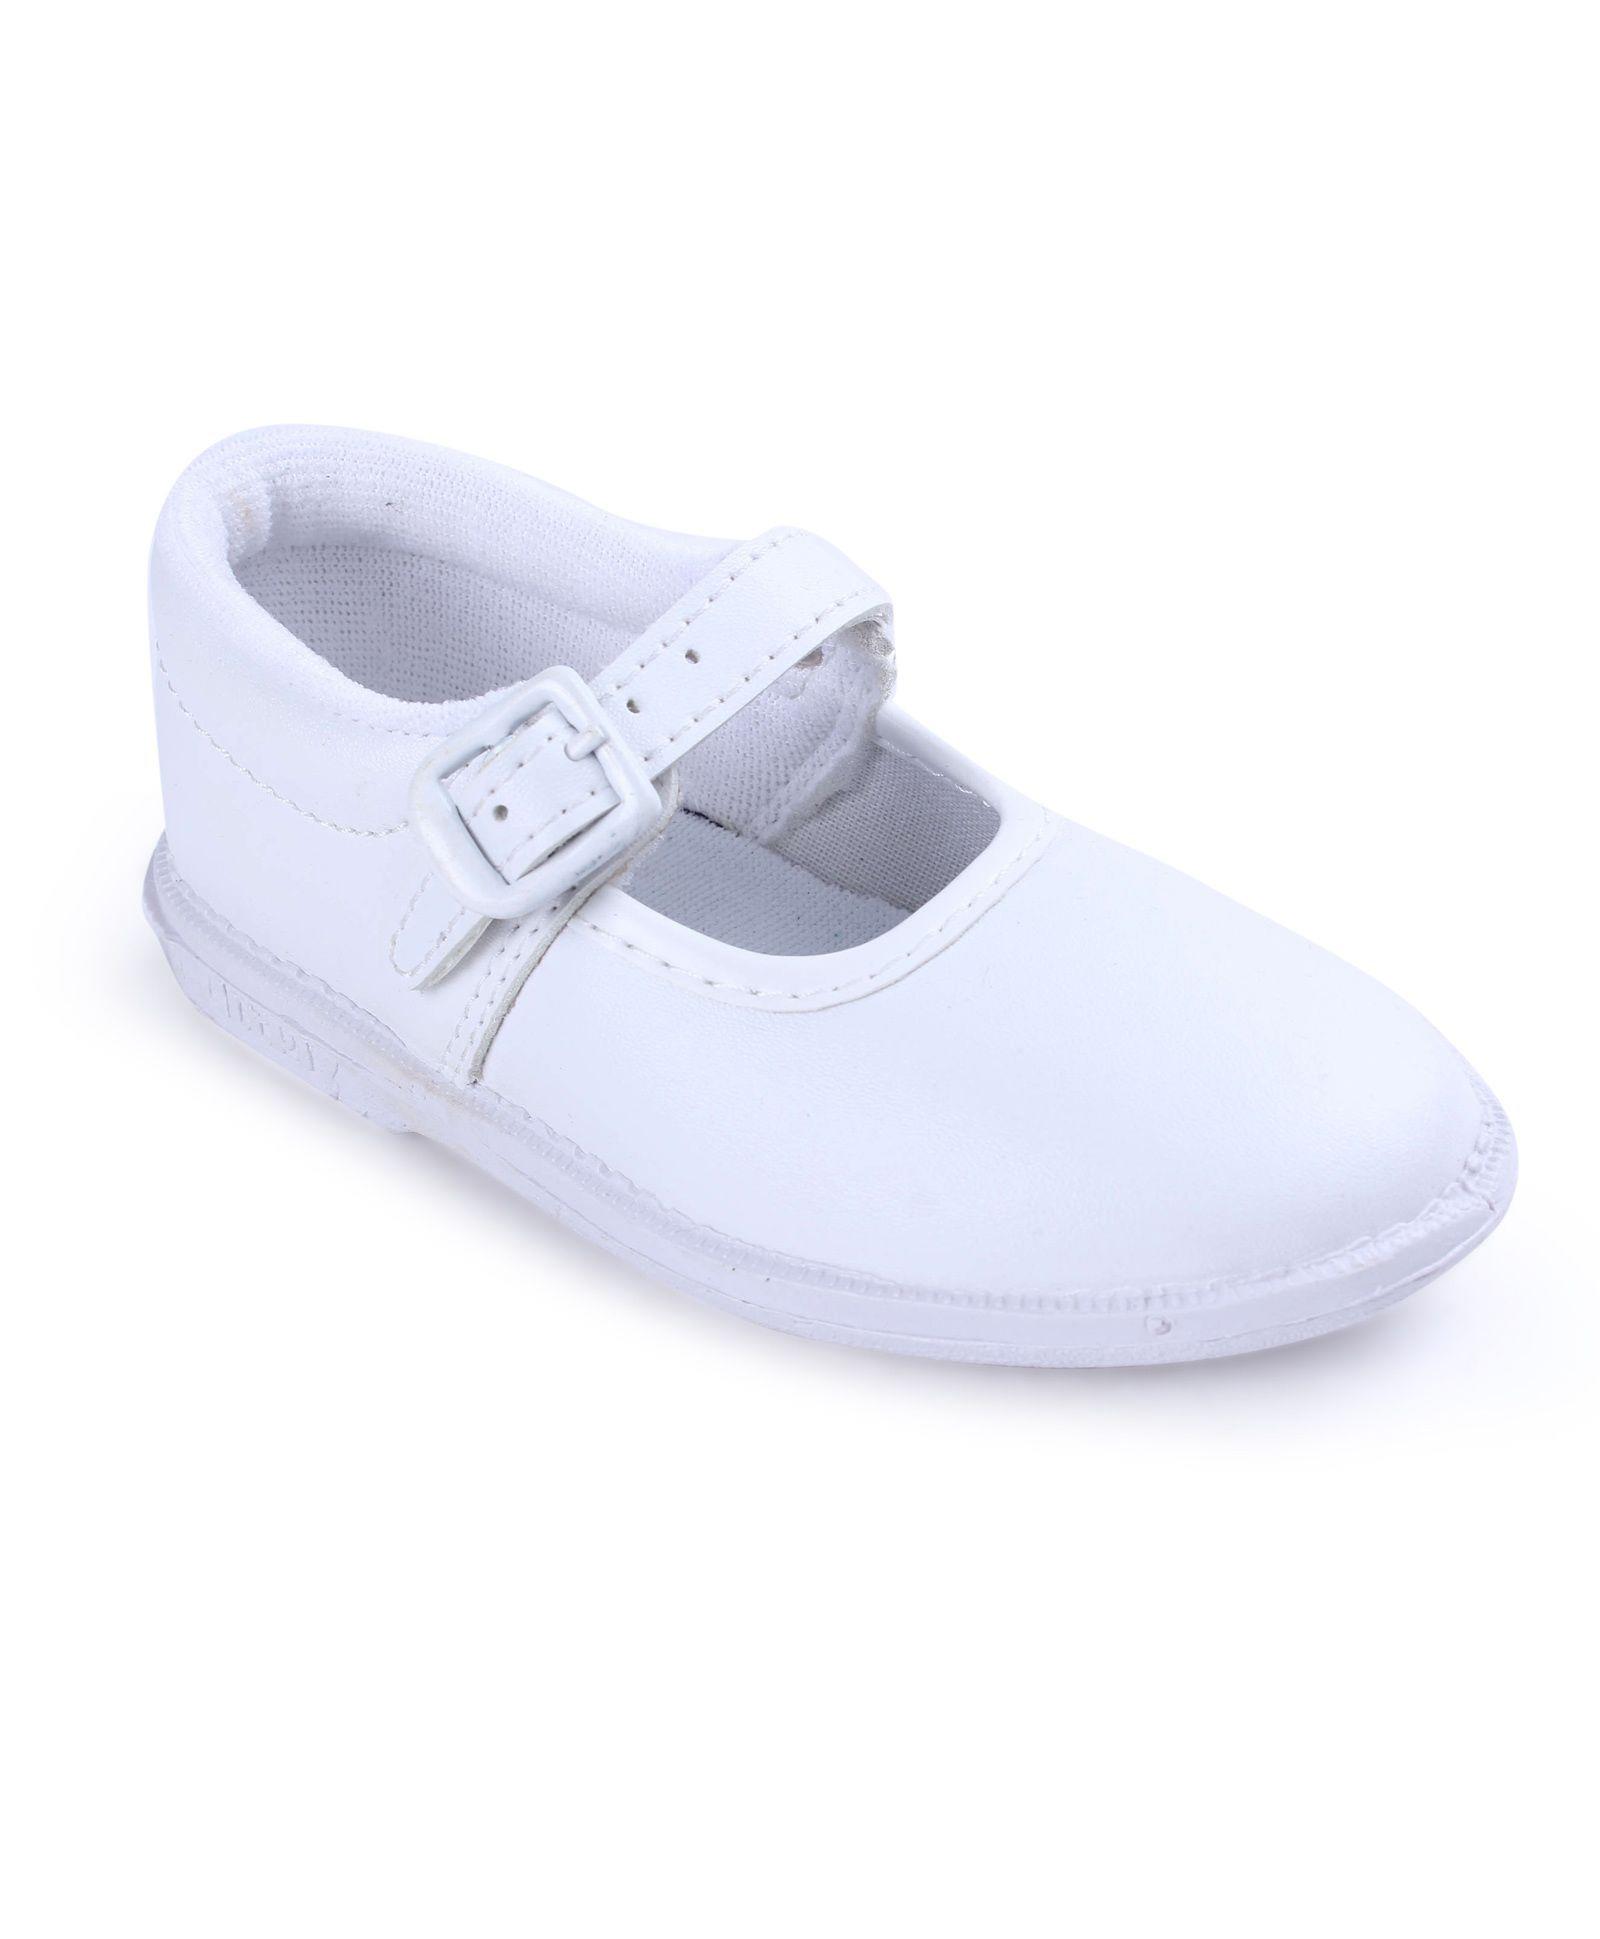 Prefect By Liberty School Shoes - White